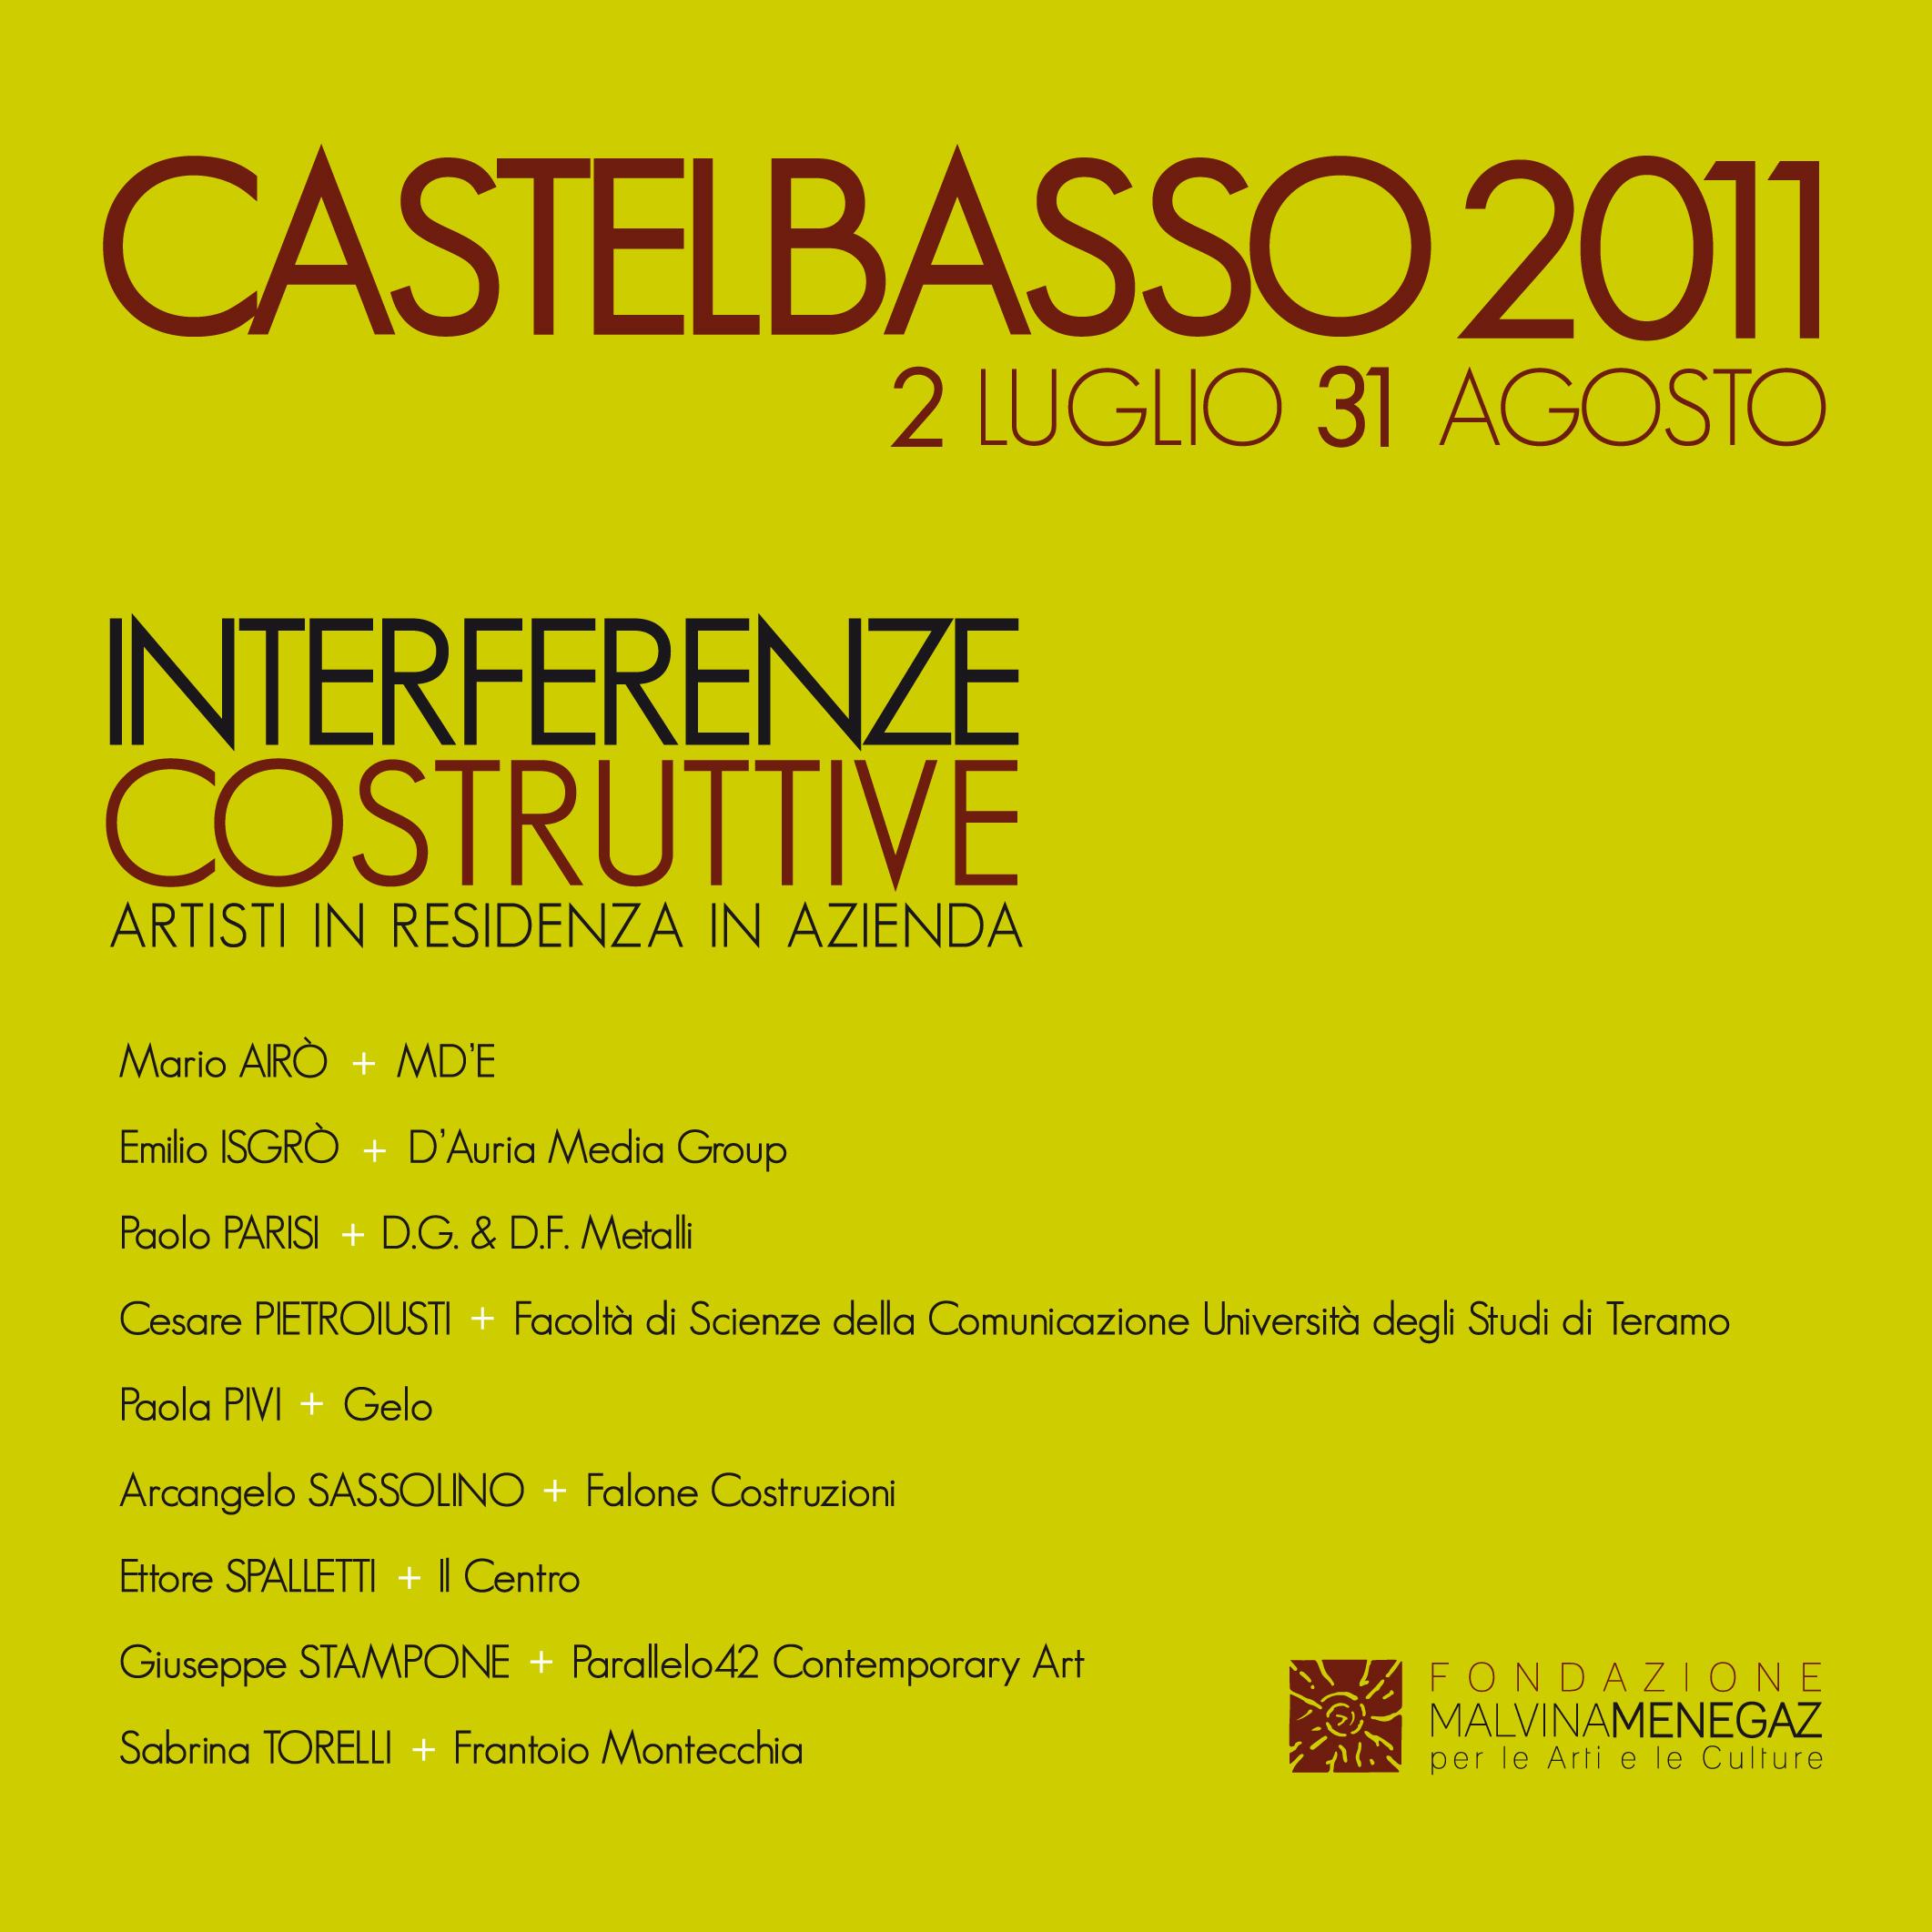 Interferenze costruttive